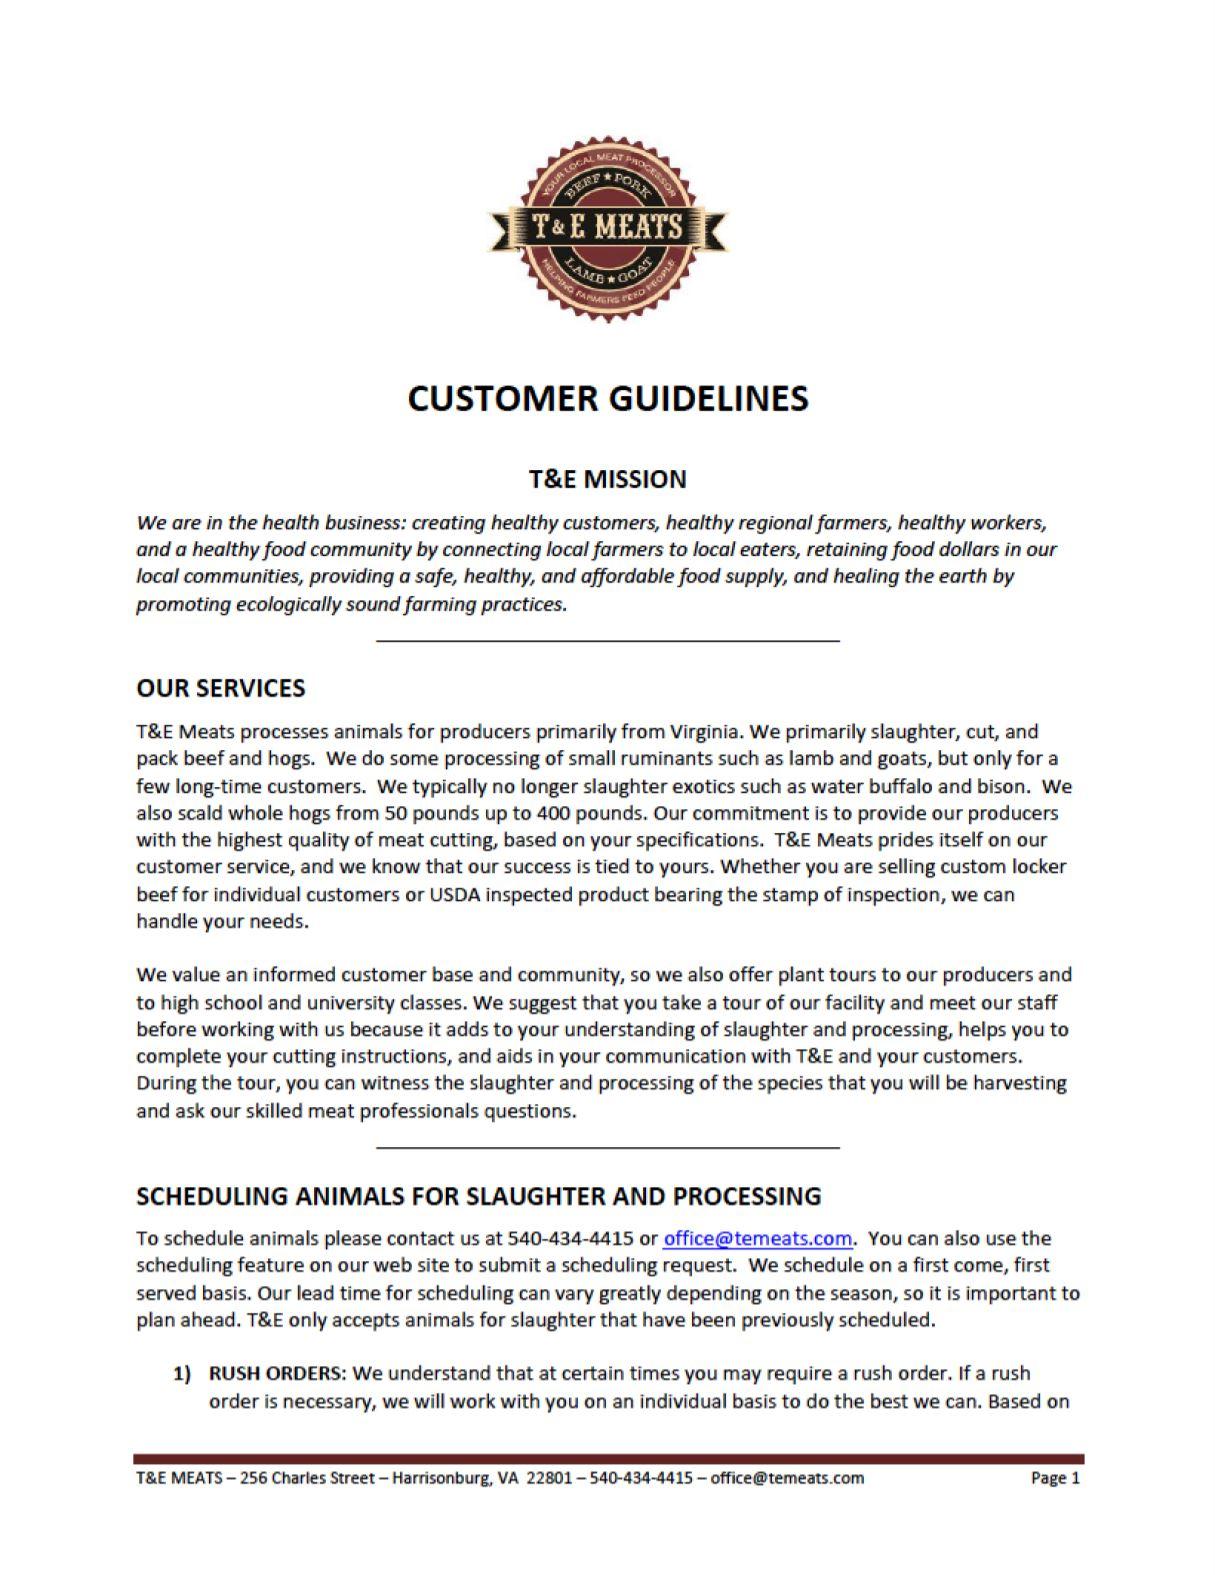 2020 customer guidelines